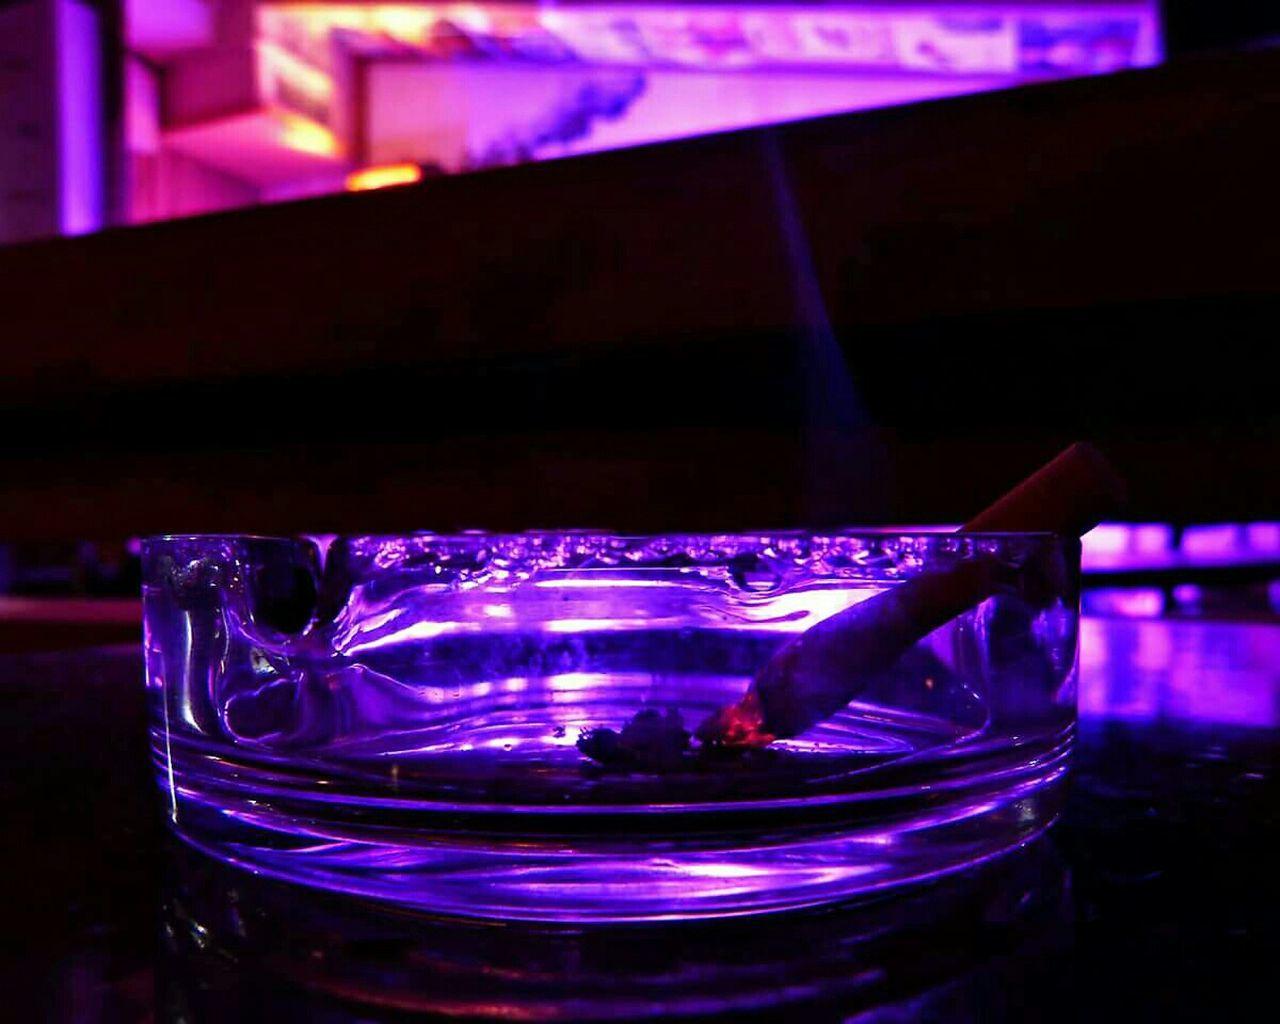 Close-up Ashtray  Cigarette Time Purple Color Indoors  No People Illuminated